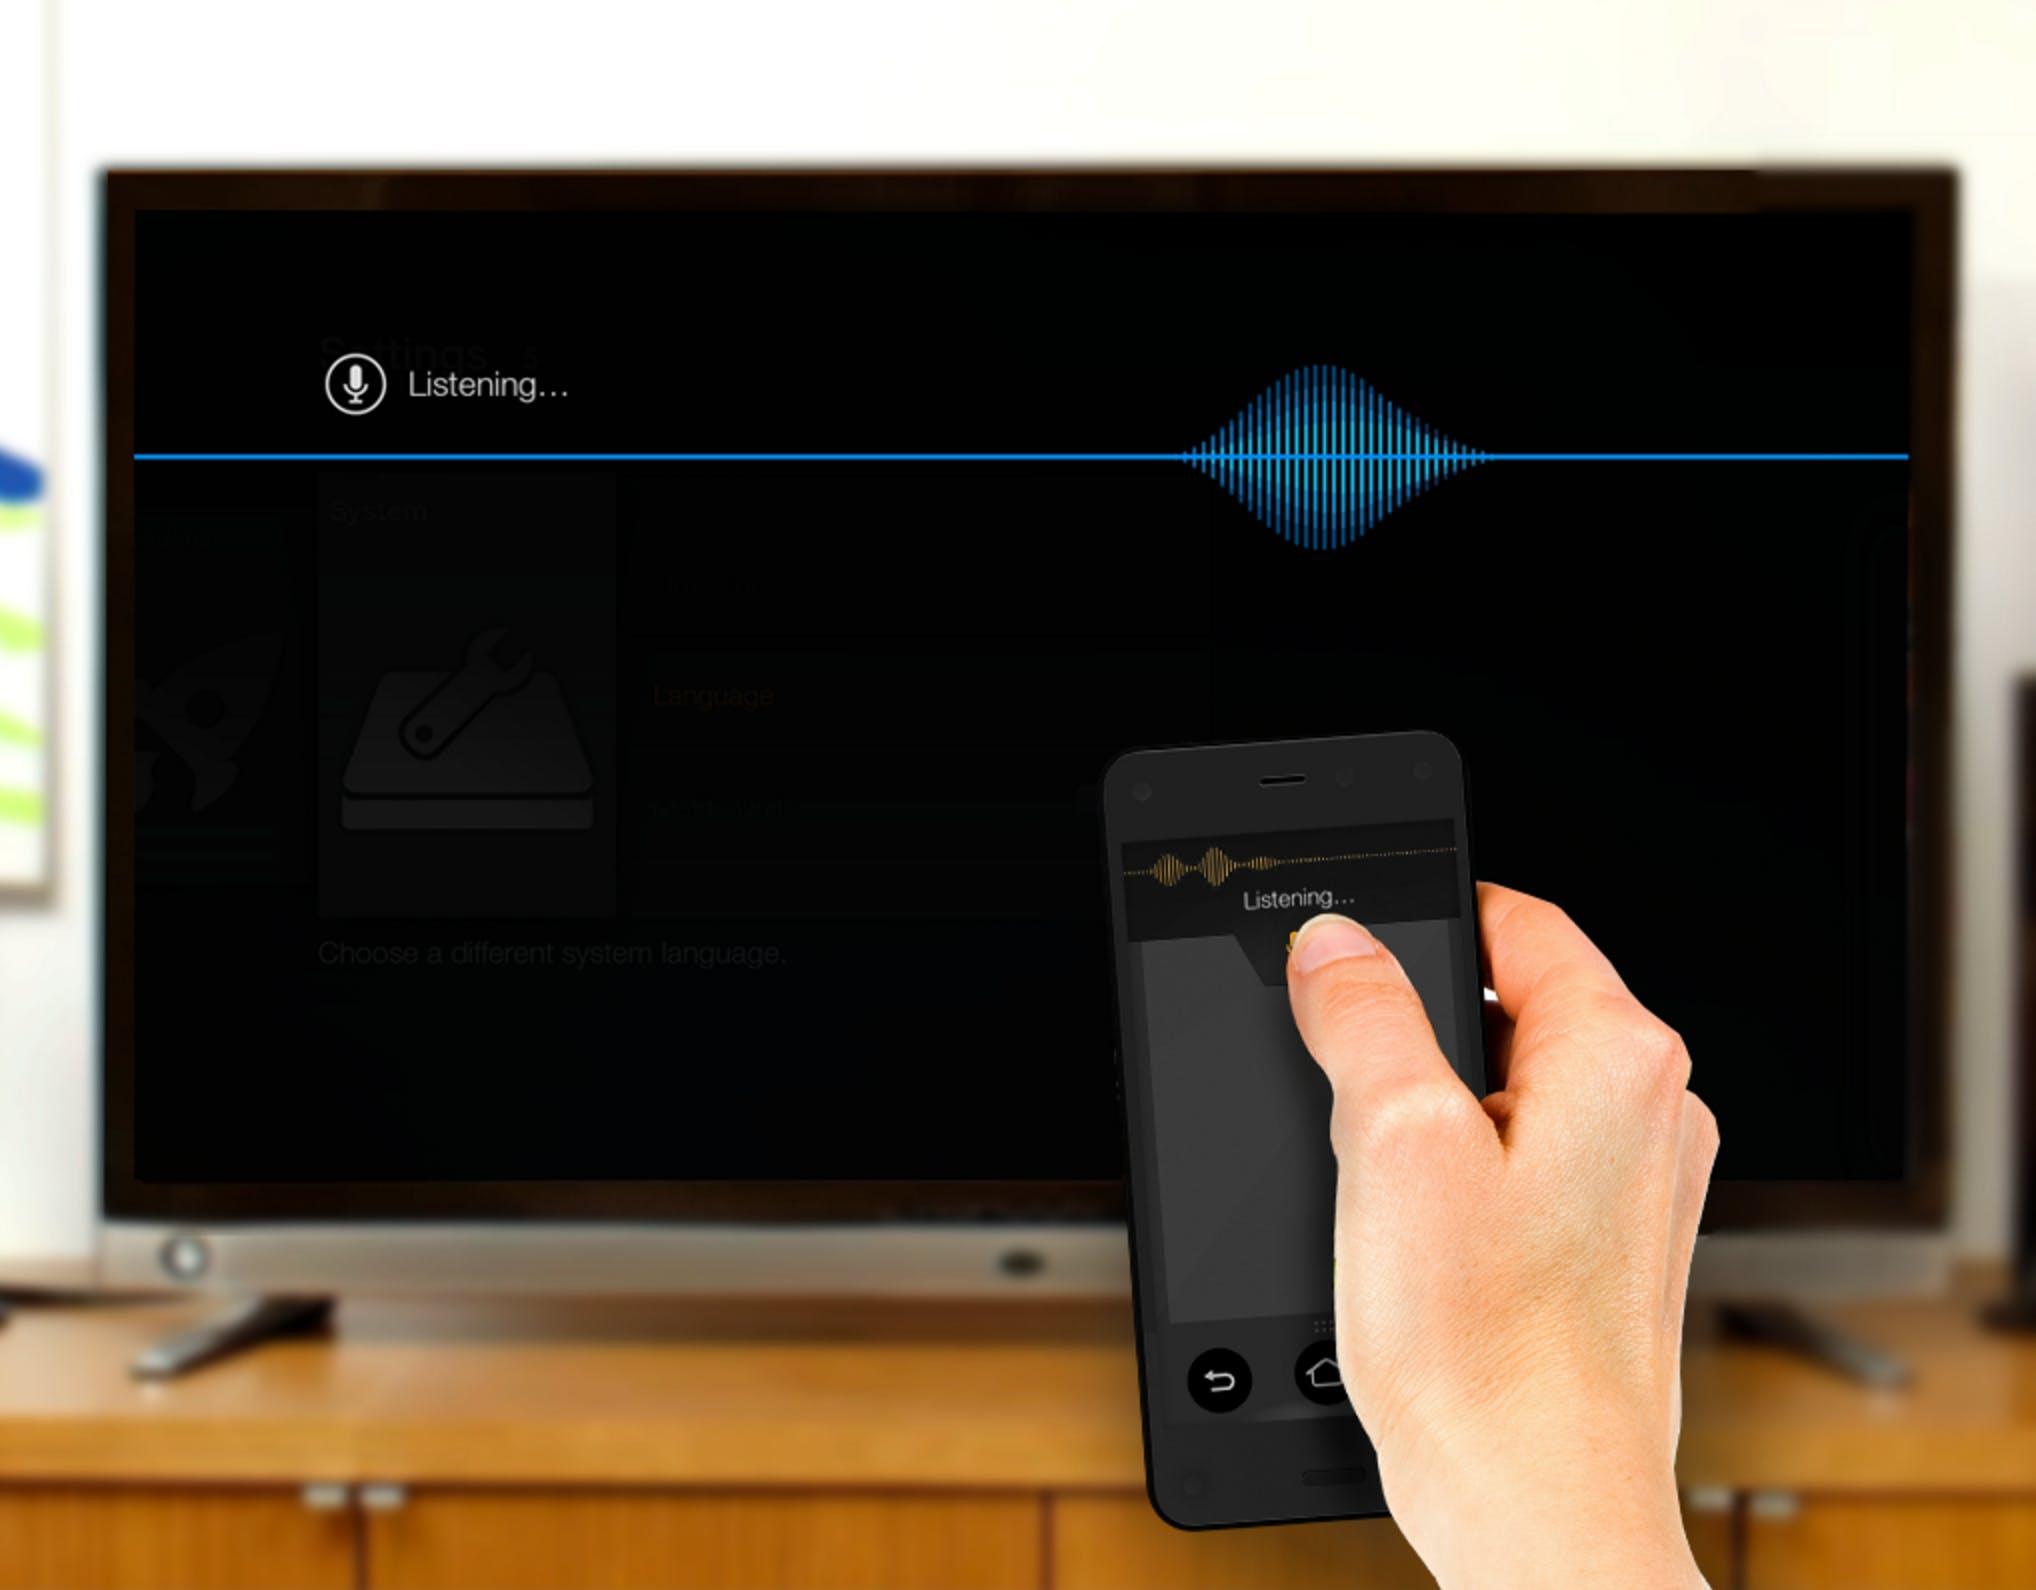 smart tv keyboard : Amazon Fire TV google play